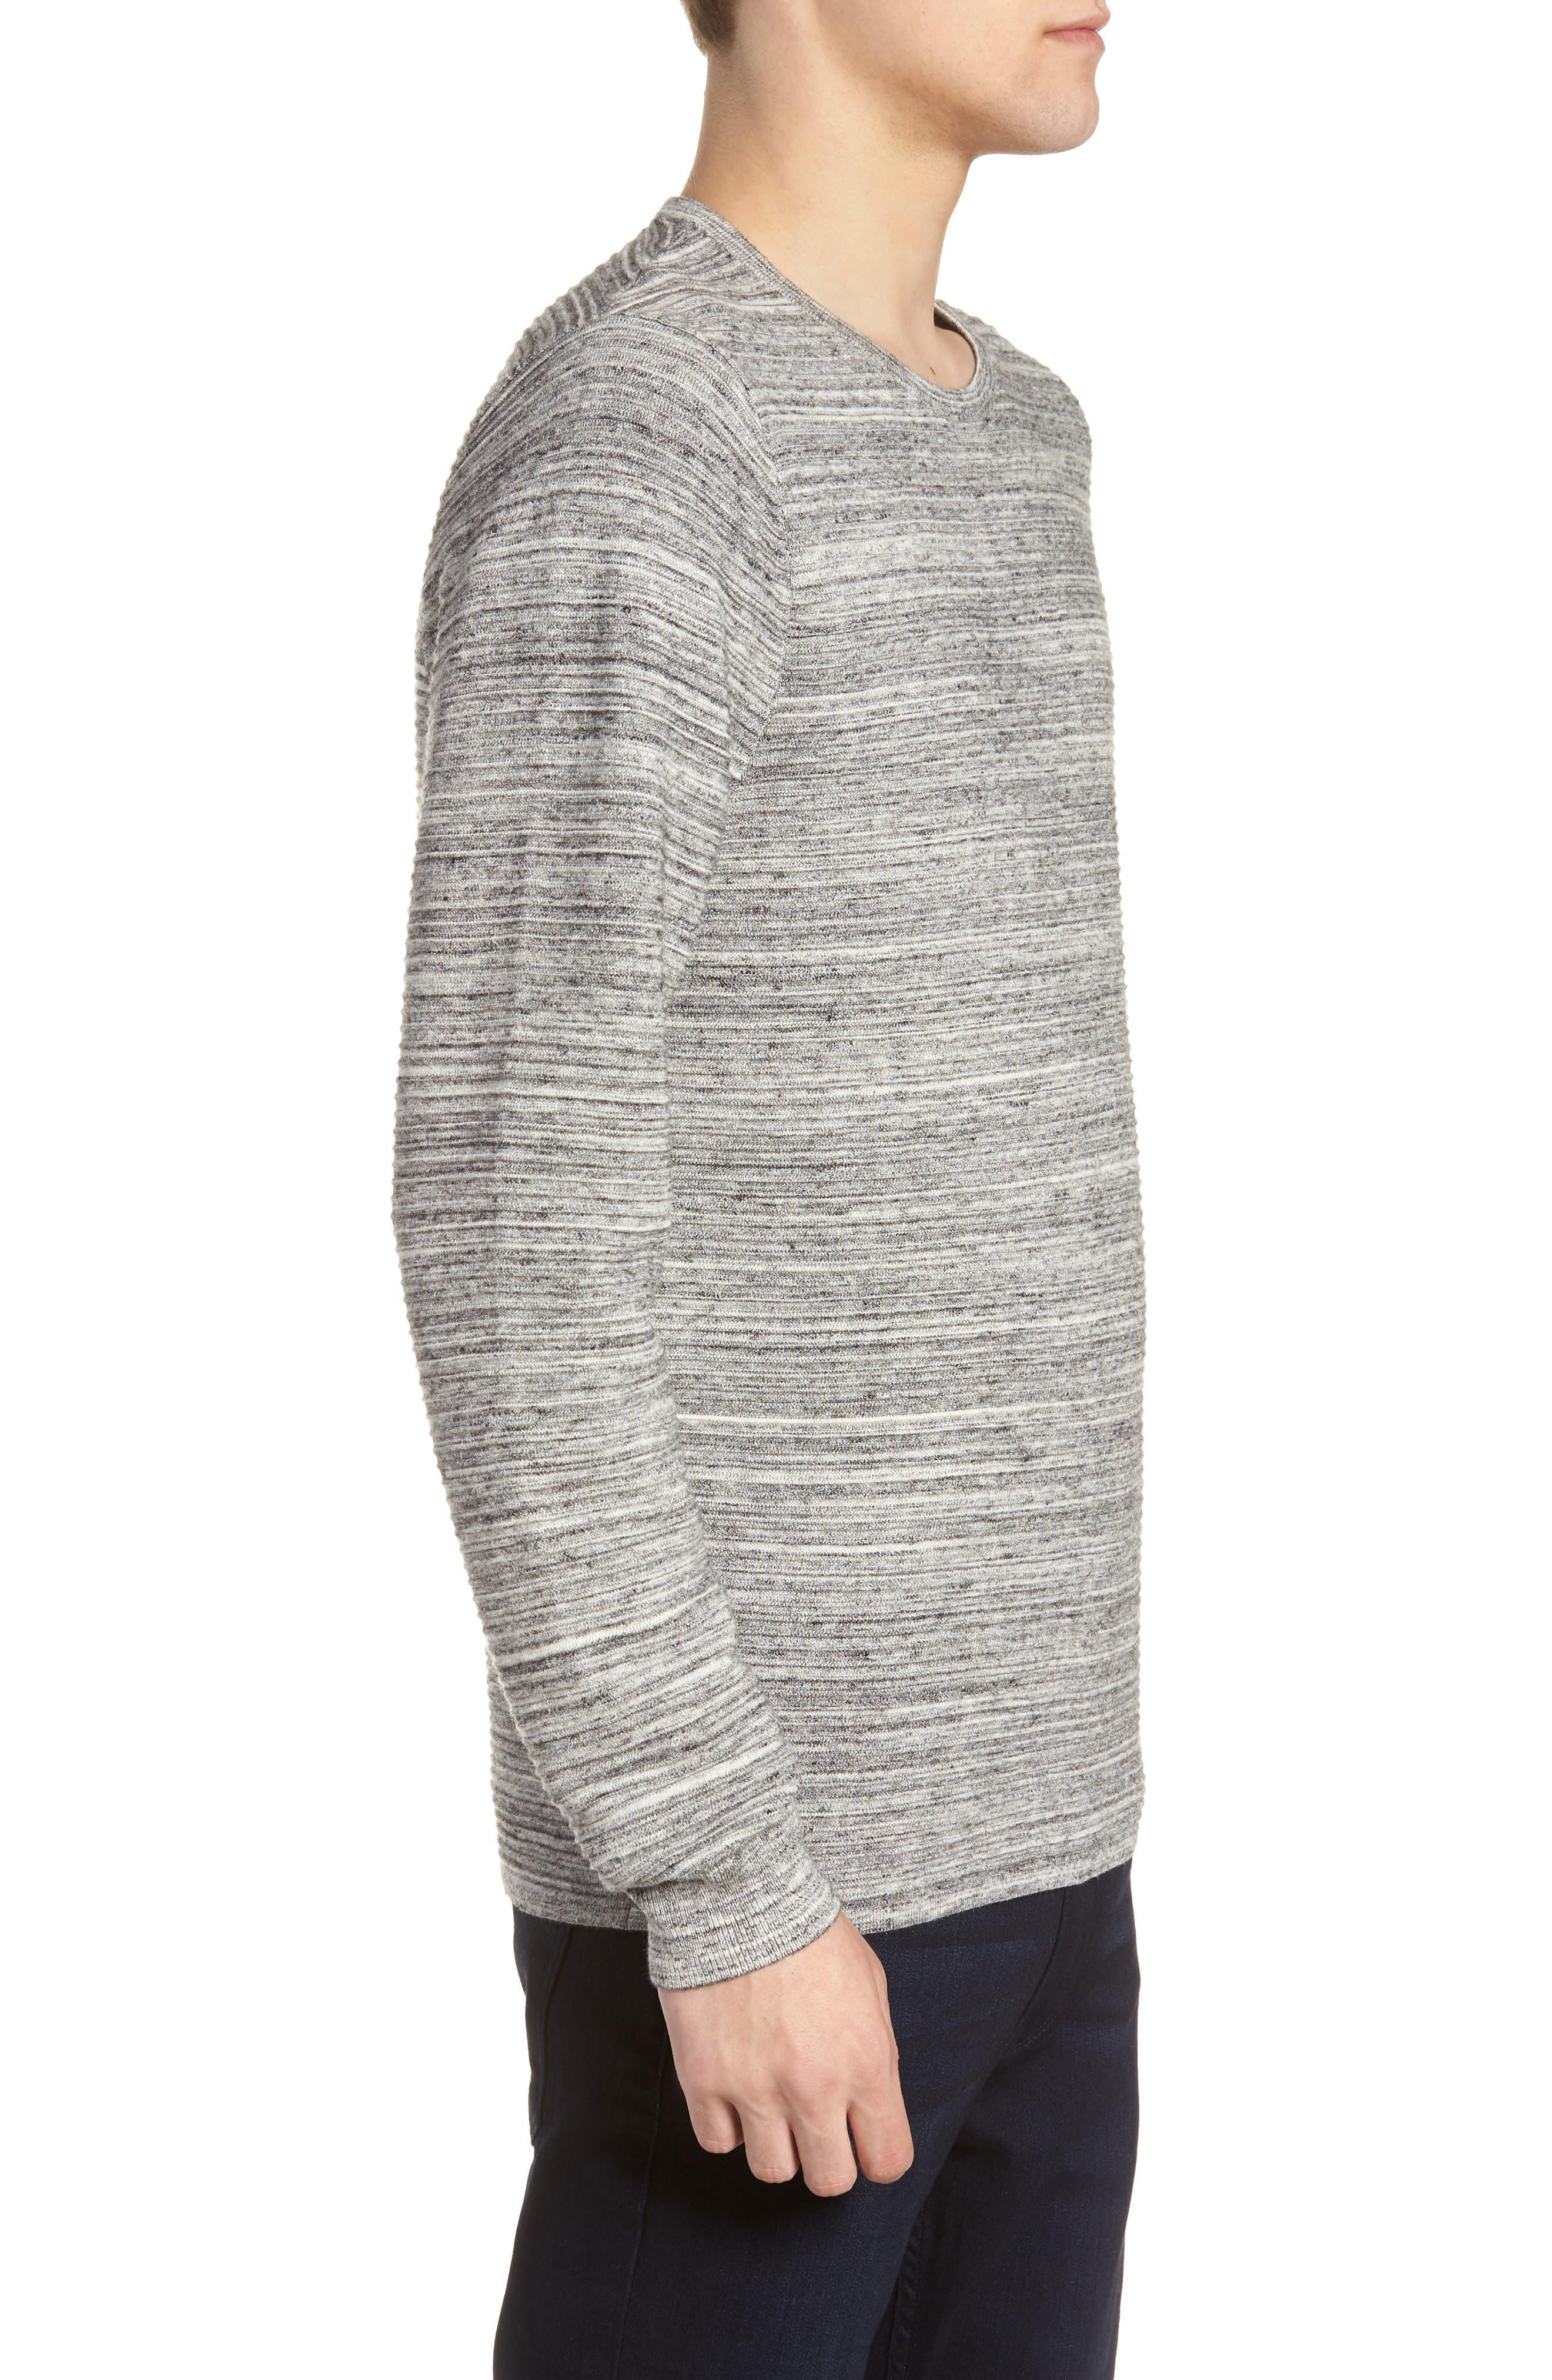 Ottoman Crewneck Sweater,                             Alternate thumbnail 3, color,                             GREY TORNADO SPACEDYE